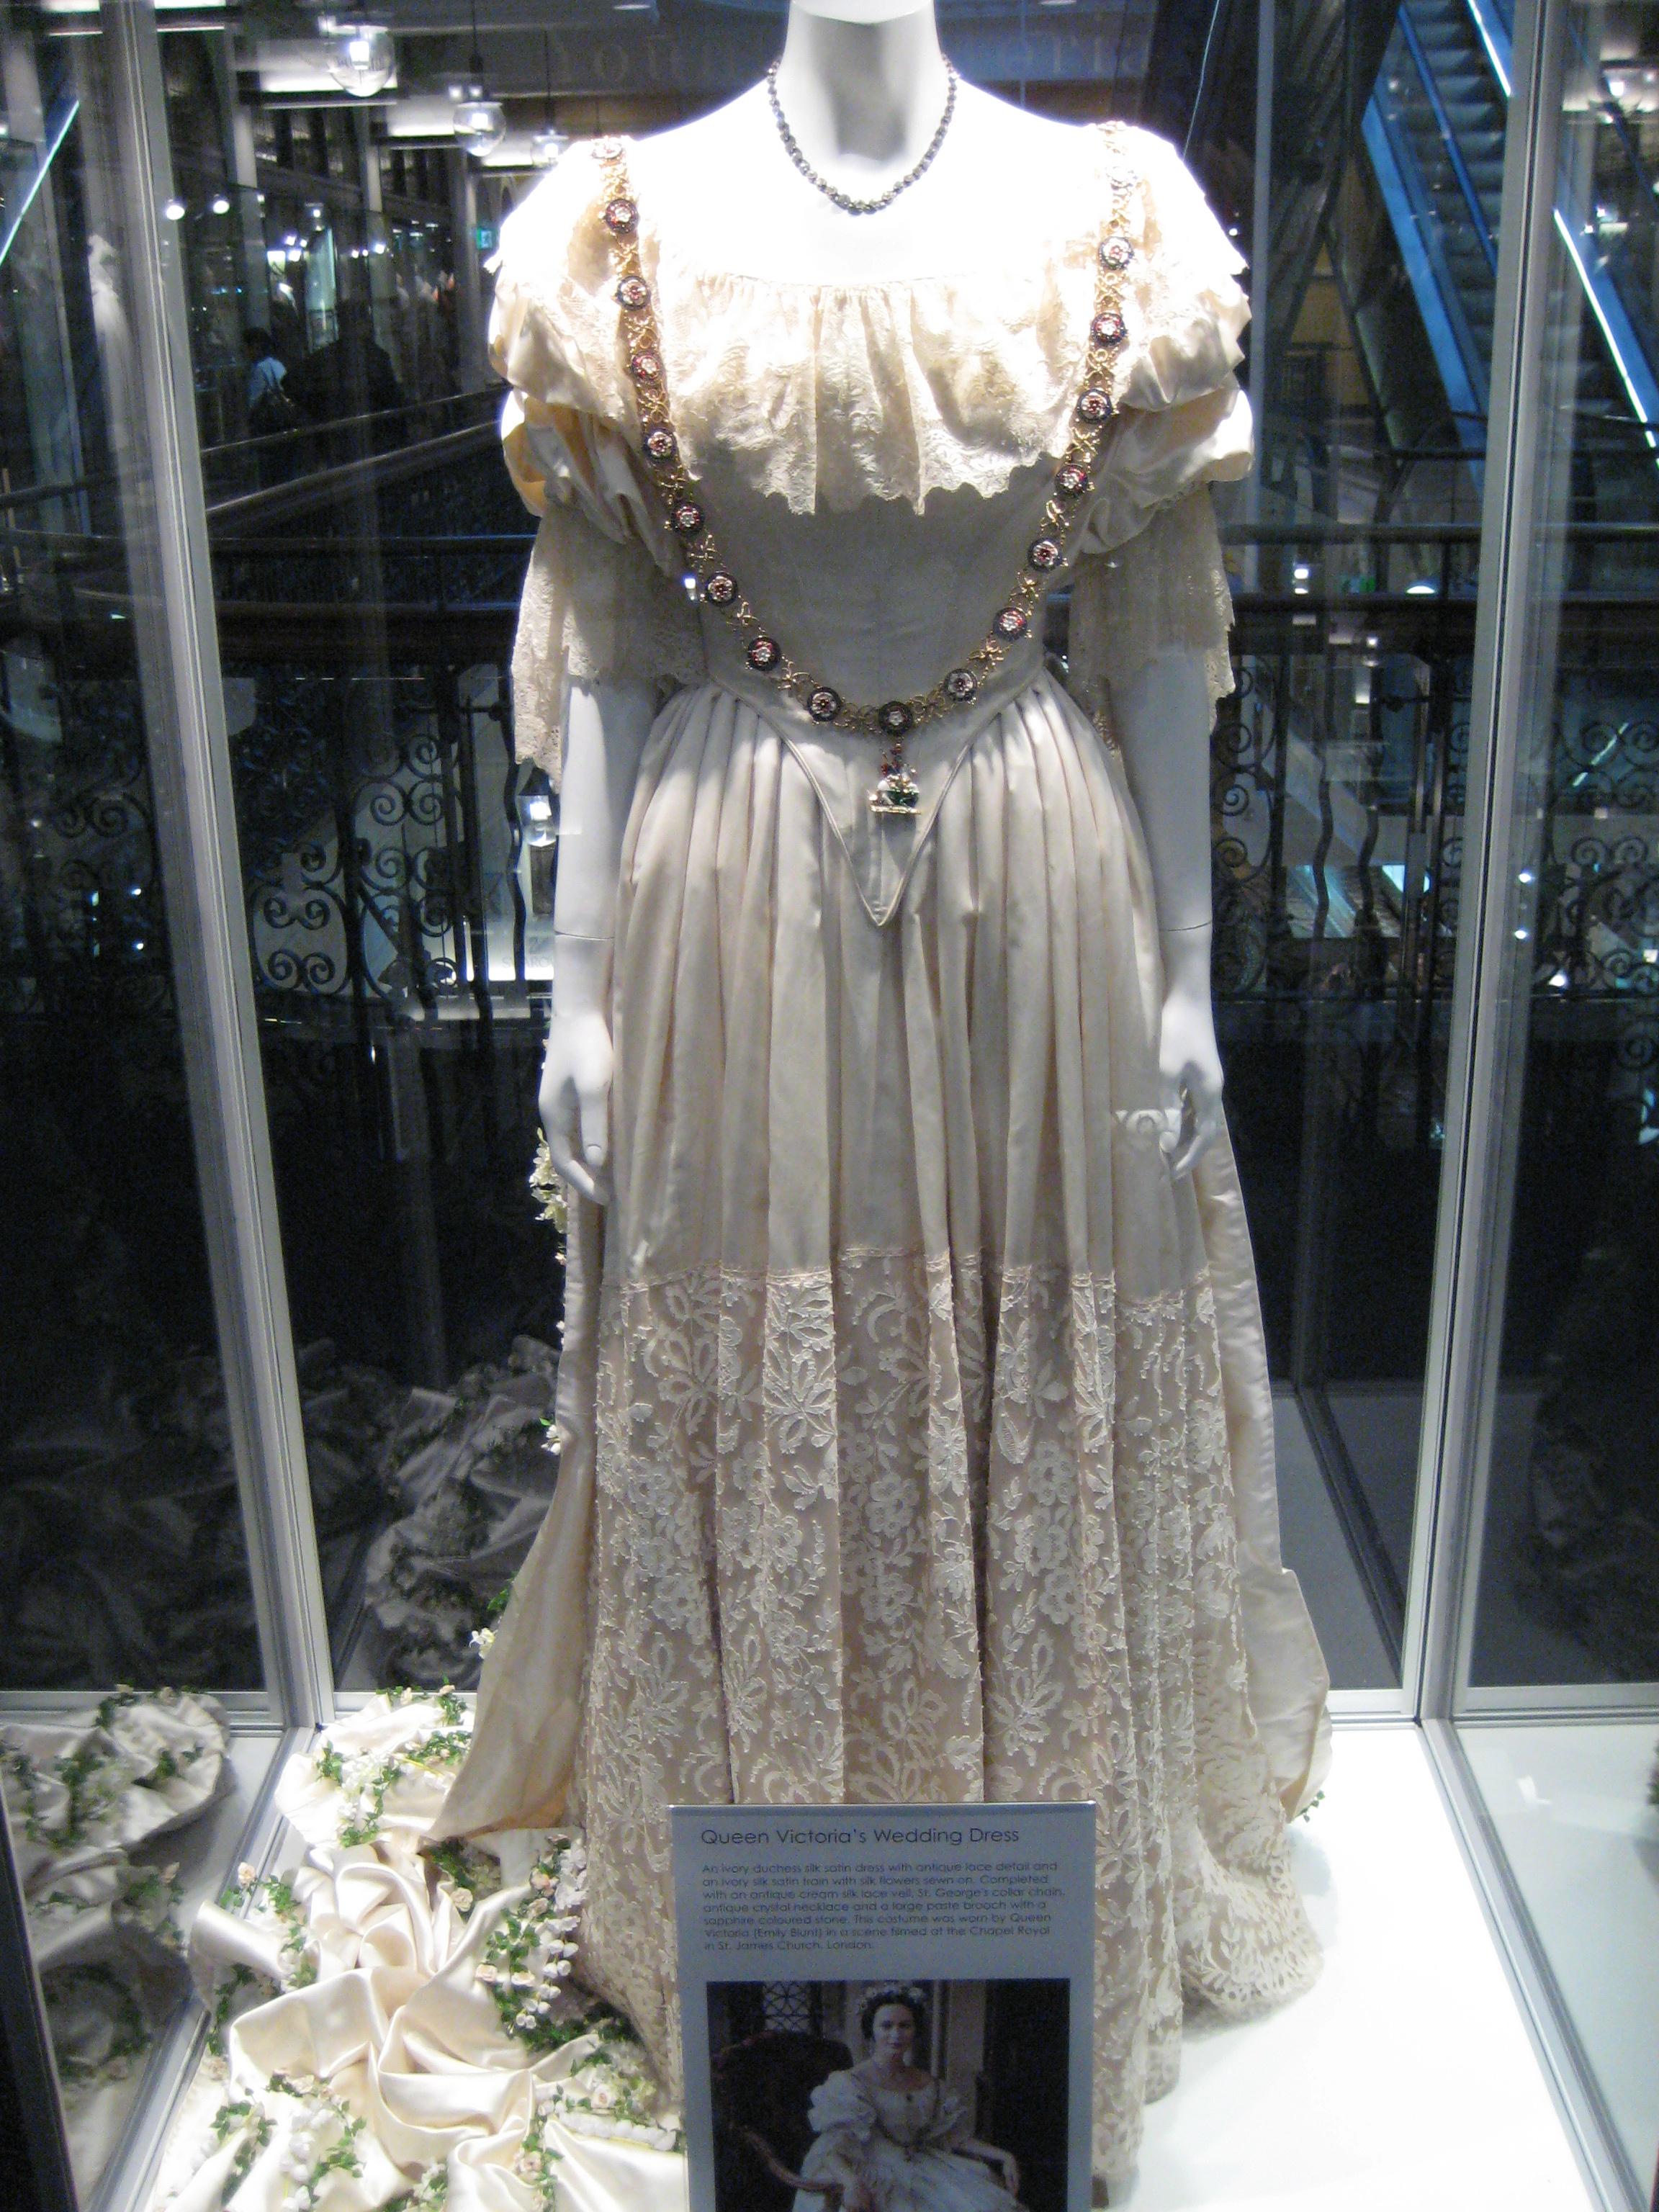 Queen victoria 39 s wedding dress used in filming young queen for Used wedding dresses victoria bc